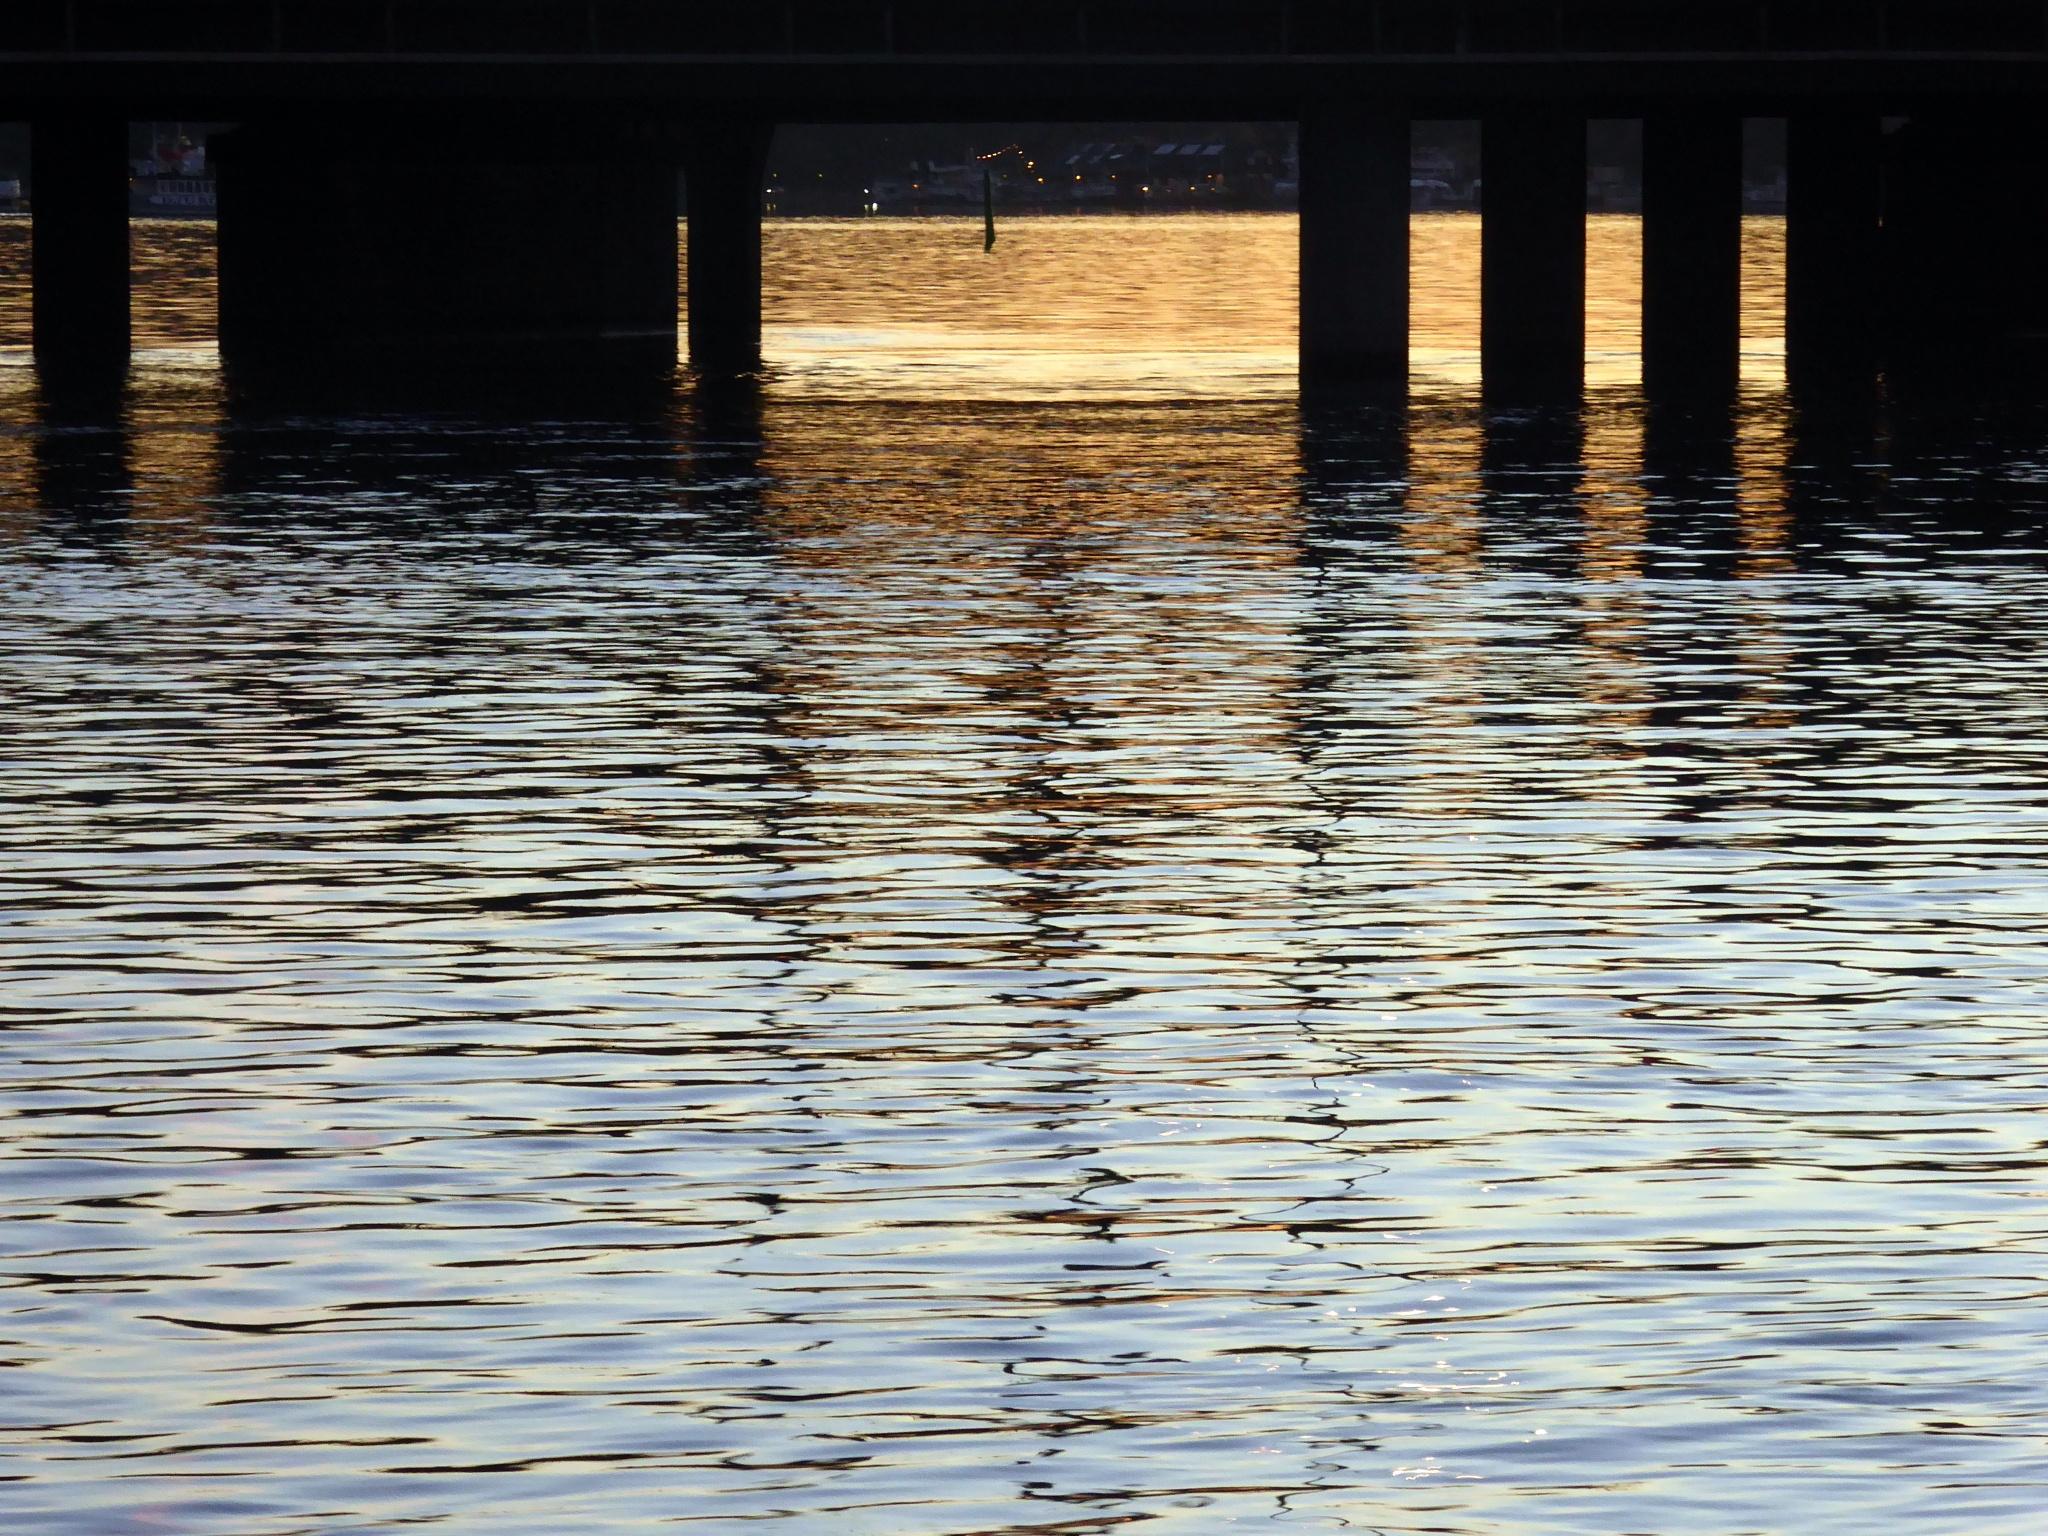 Under the bridge, Stockholm  by Informatissima